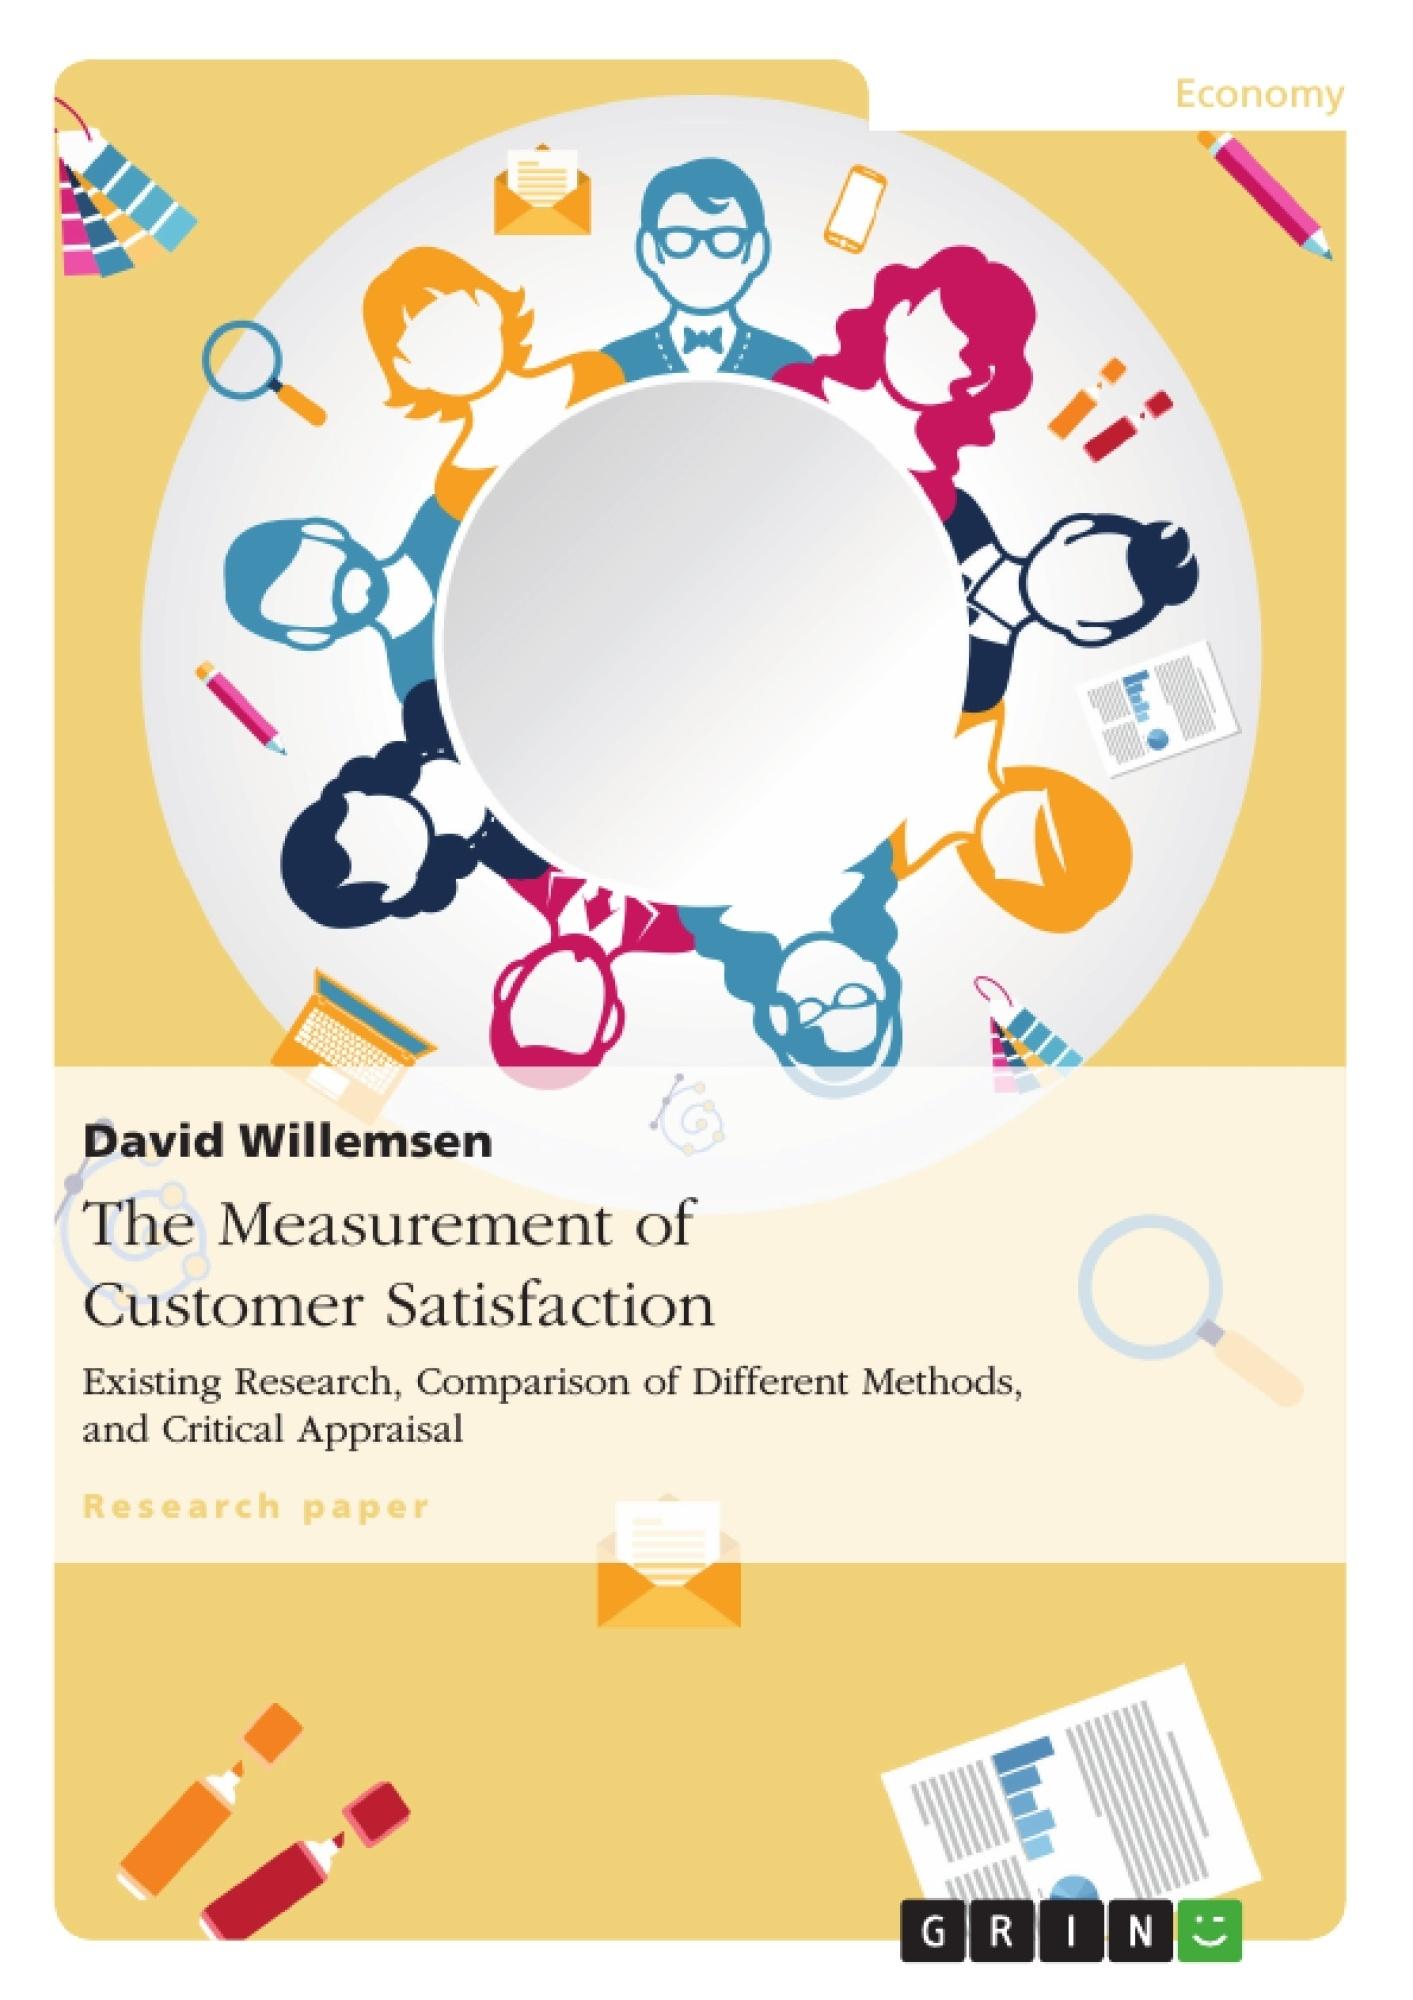 Title: The Measurement of Customer Satisfaction